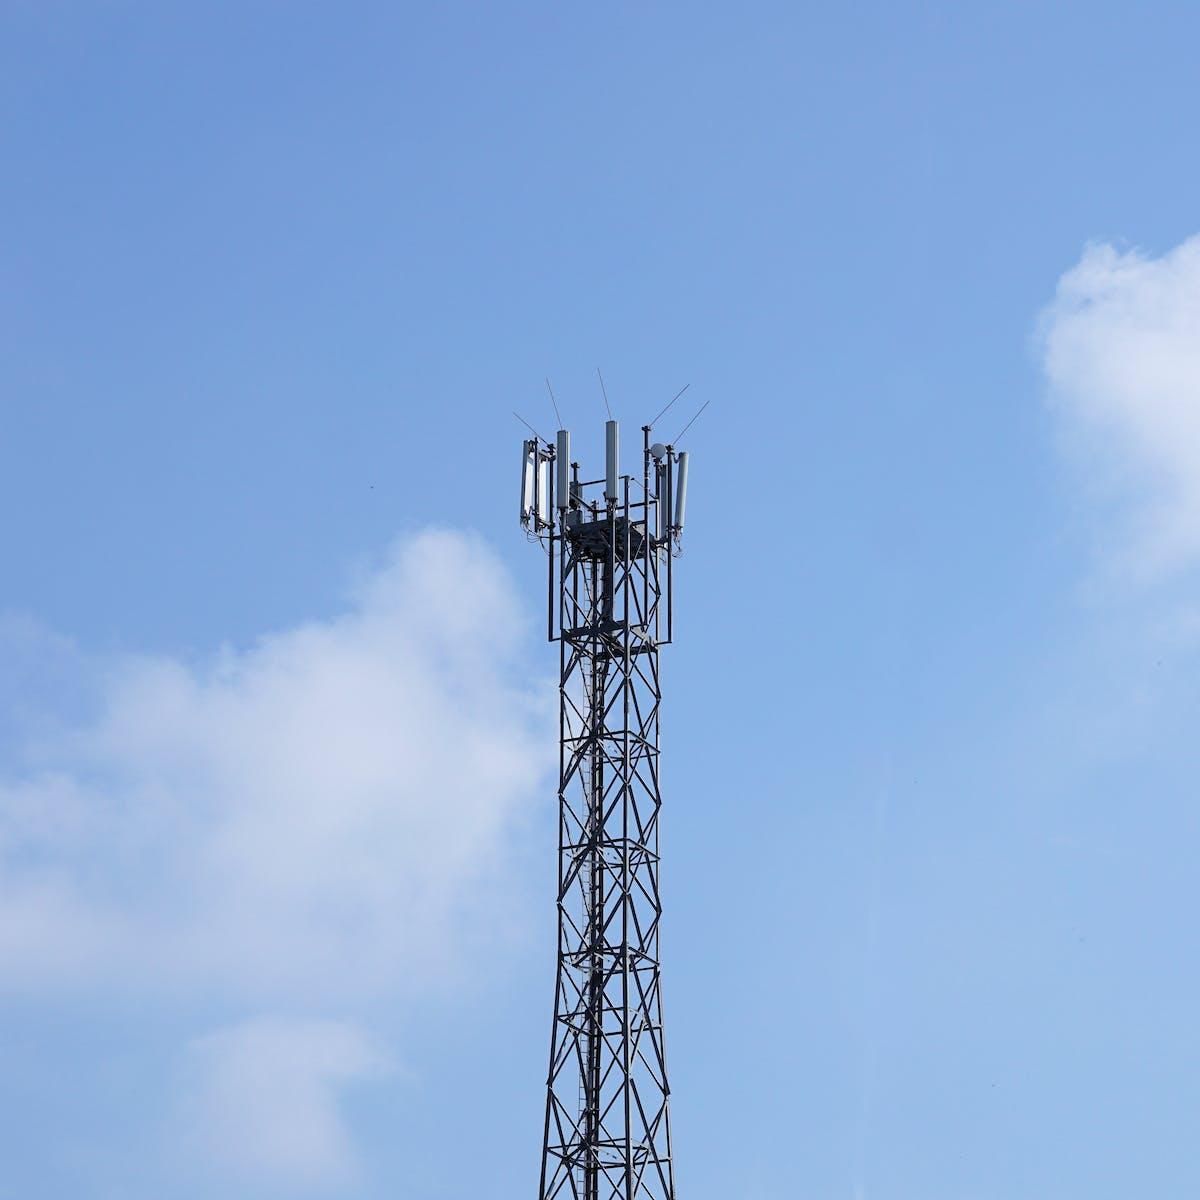 Titelbild-6G-Funkmast-Sendemast-Antenne-Sendemast-Funkantenne-pixabay-2817422-webandi